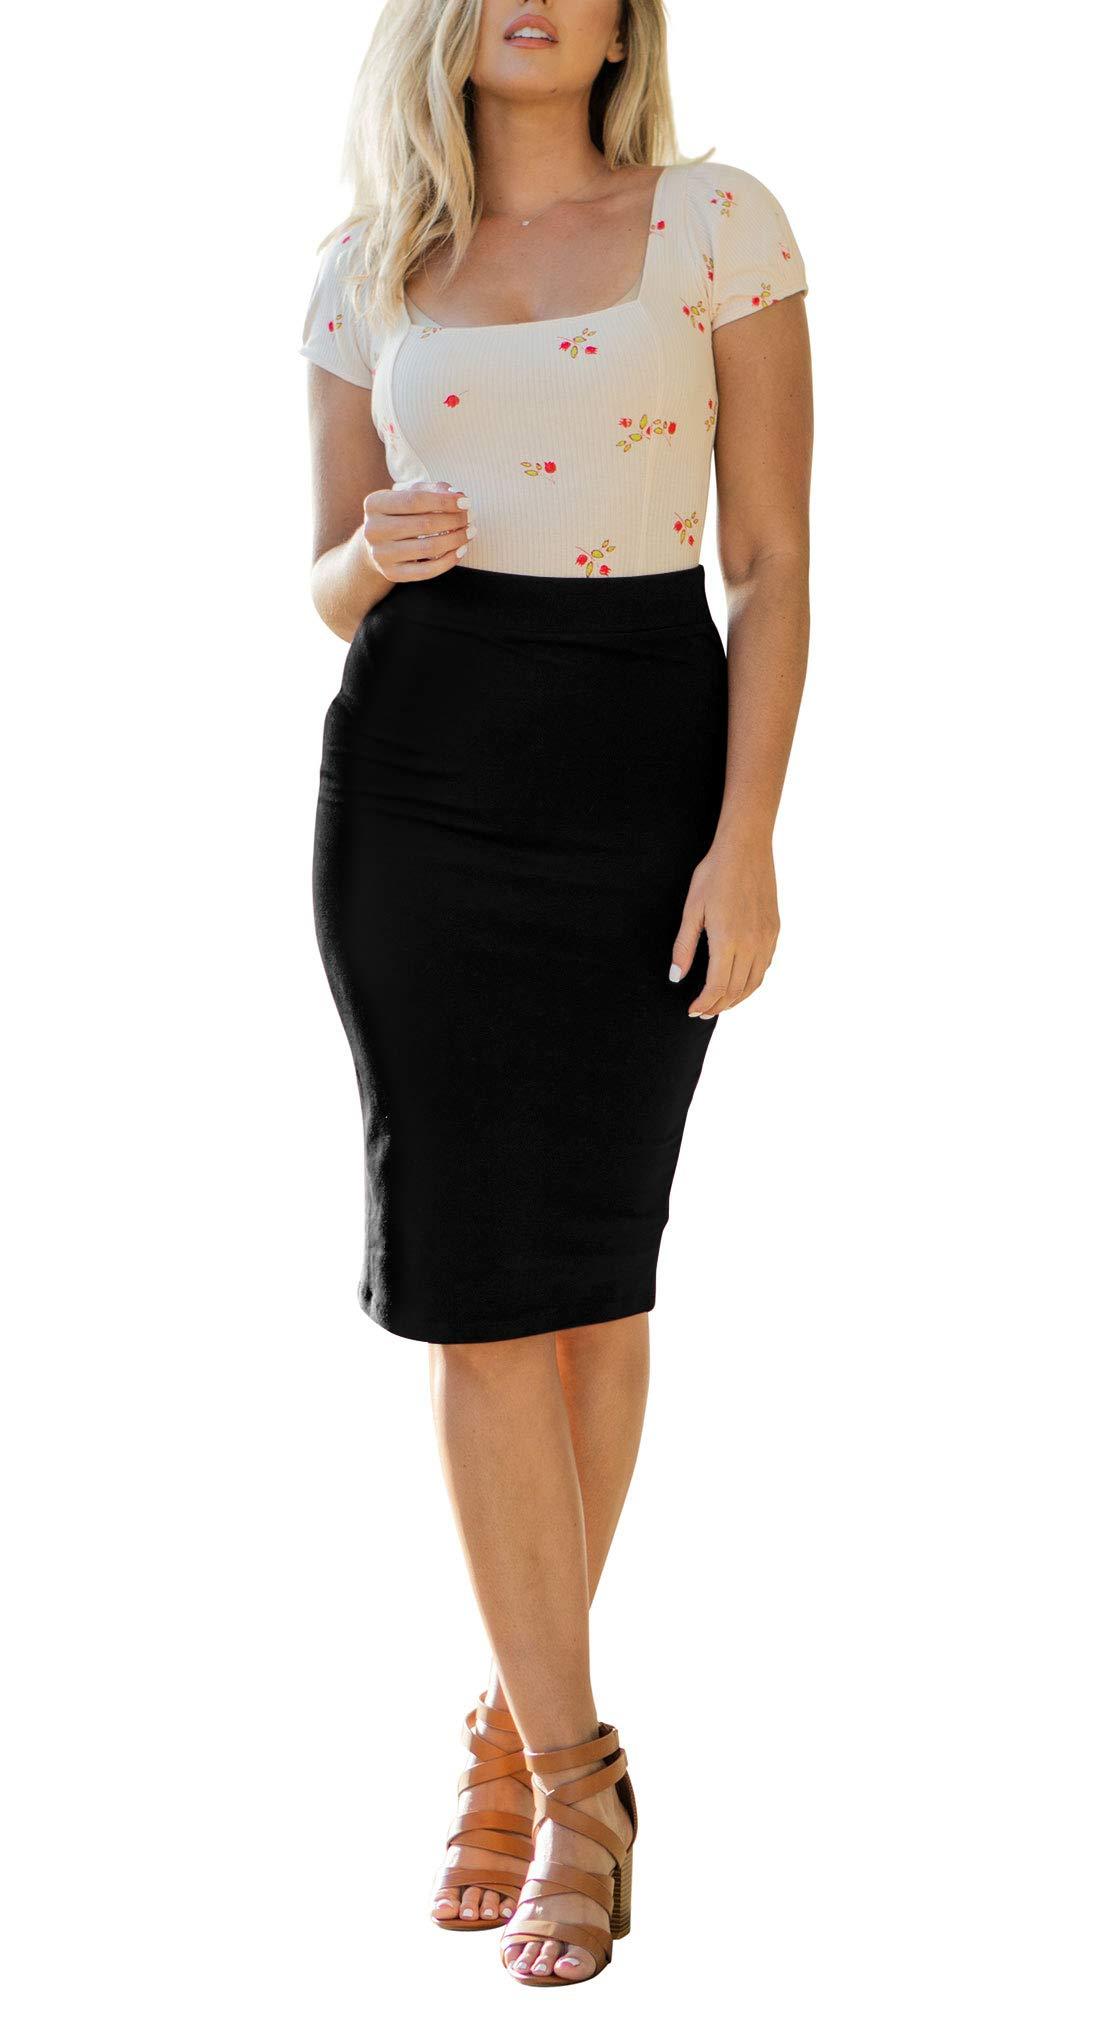 NioBe Clothing Women's High Waist Bodycon Midi Cotton Fitted Pencil Skirt